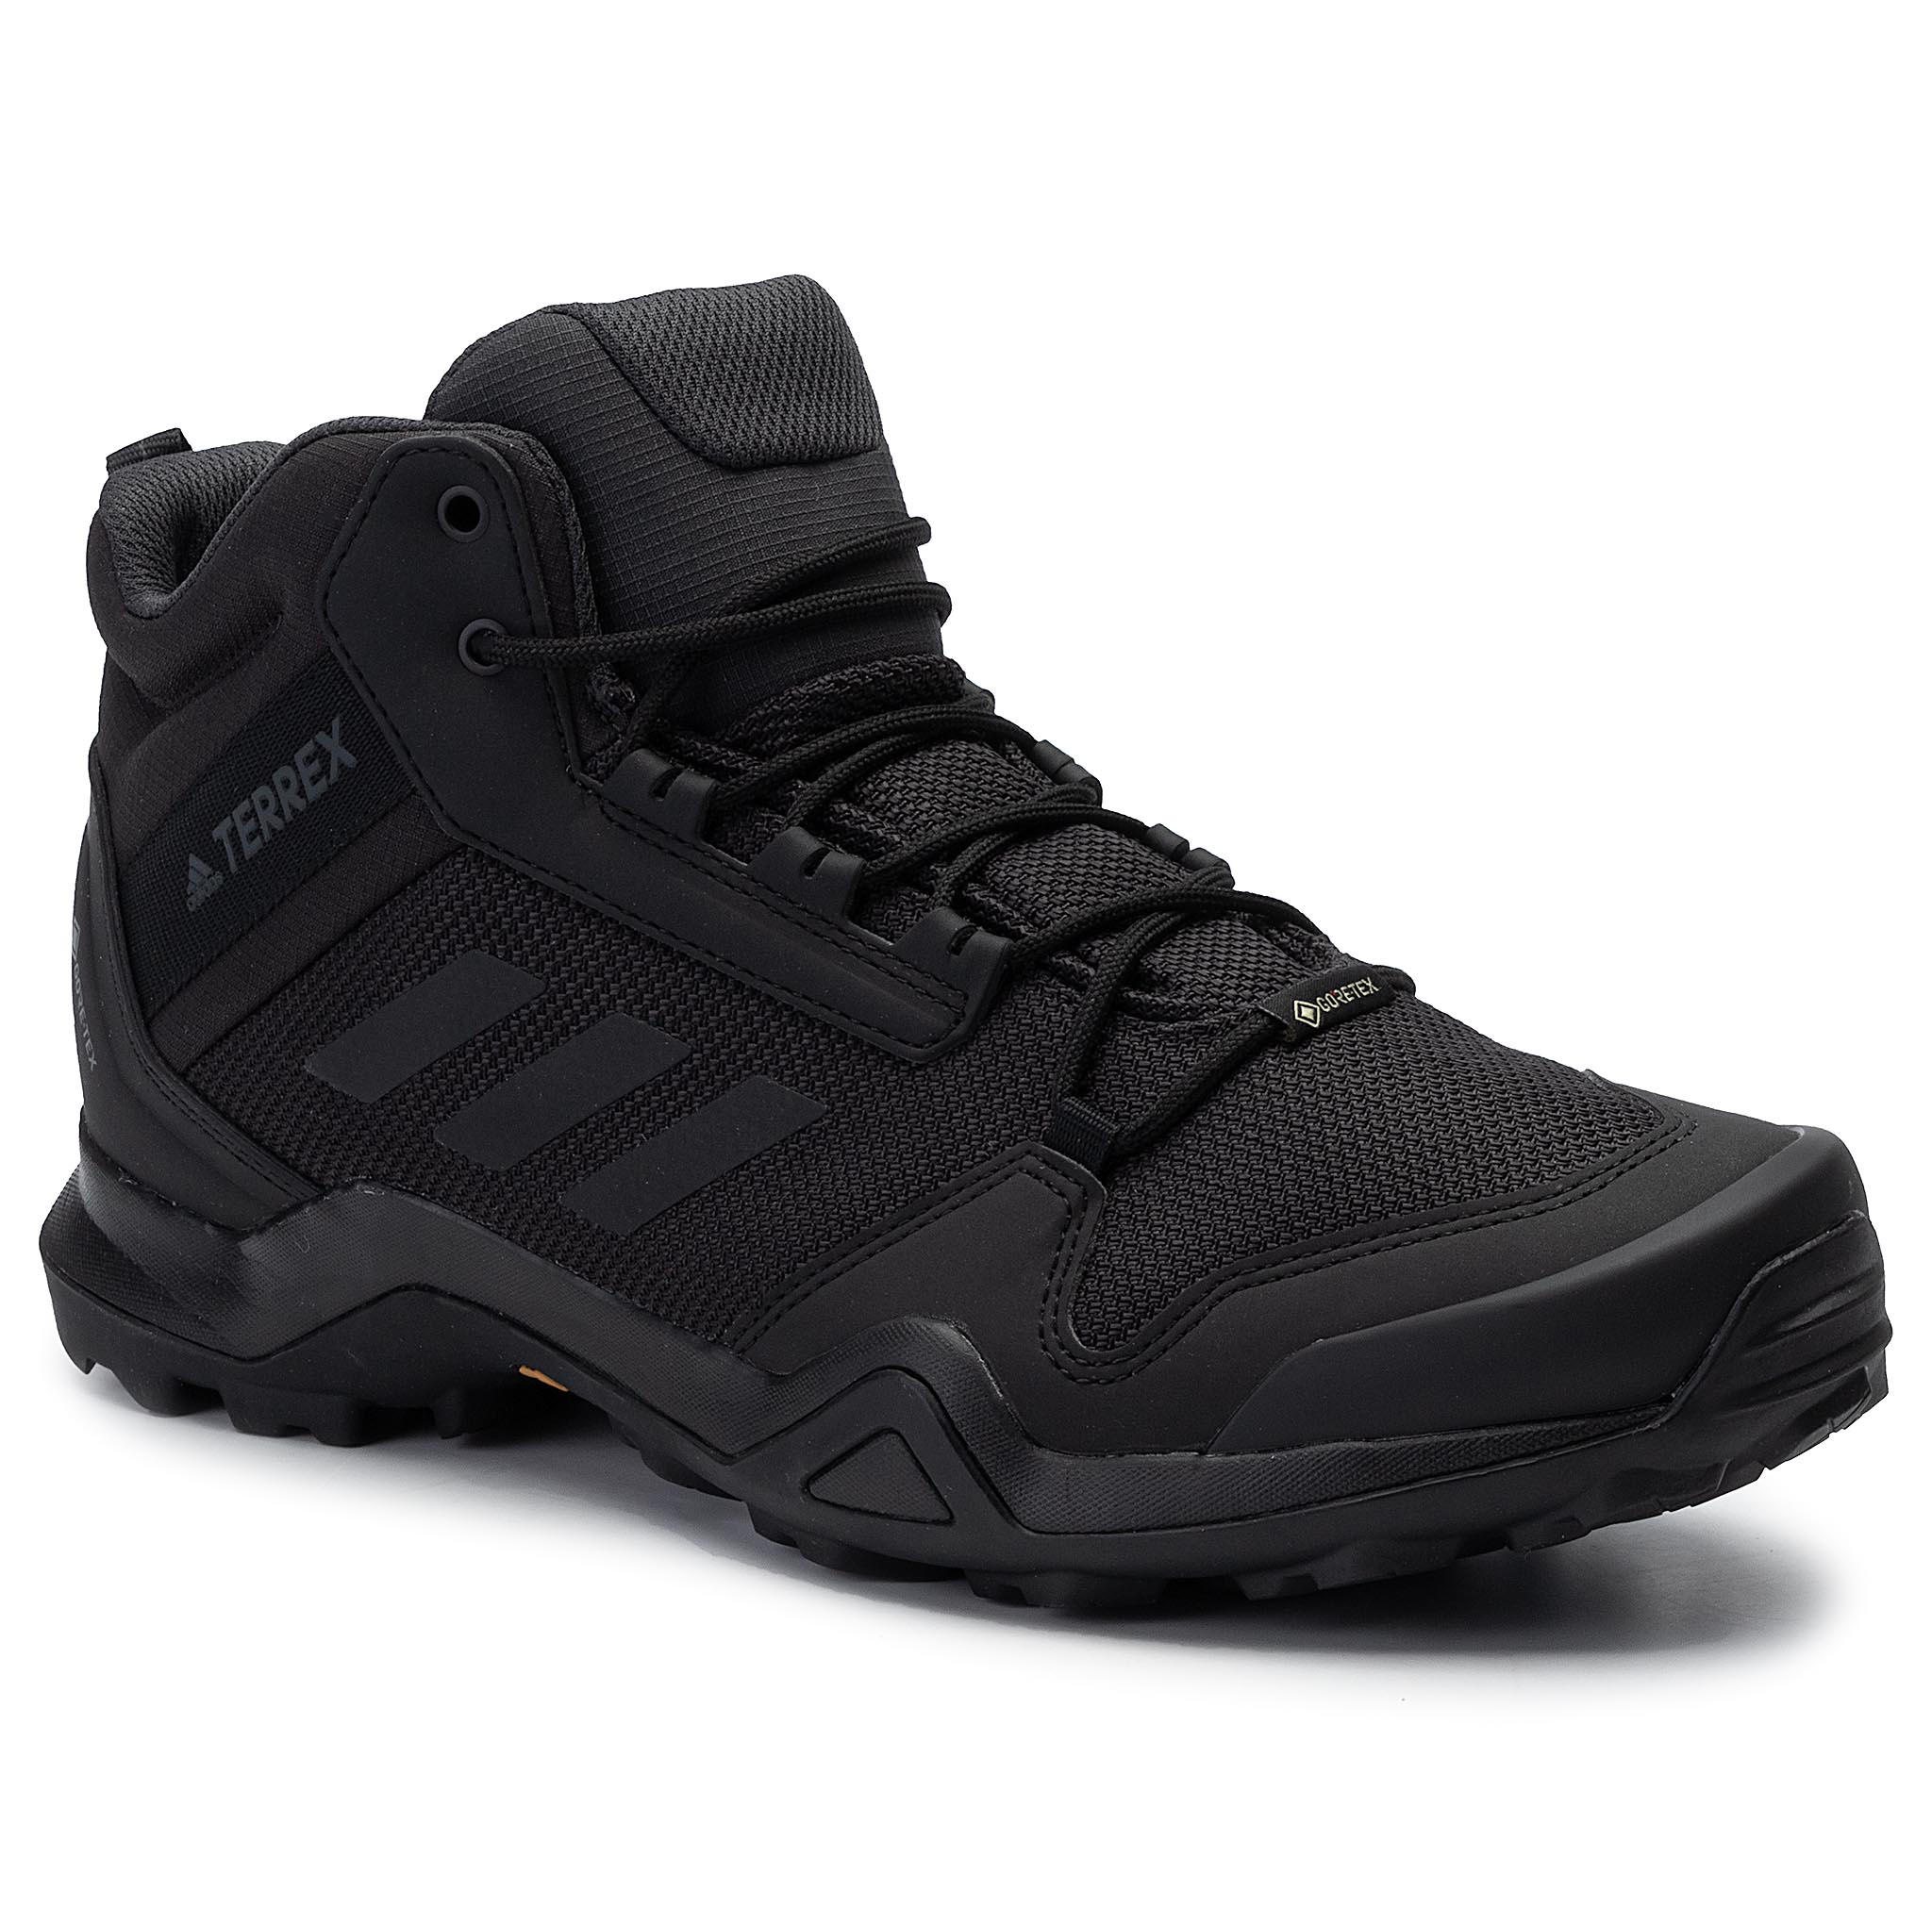 Cipő adidas Terrex Ax3 Mid Gtx GORE TEX BC0466 CblackCblackCarbon